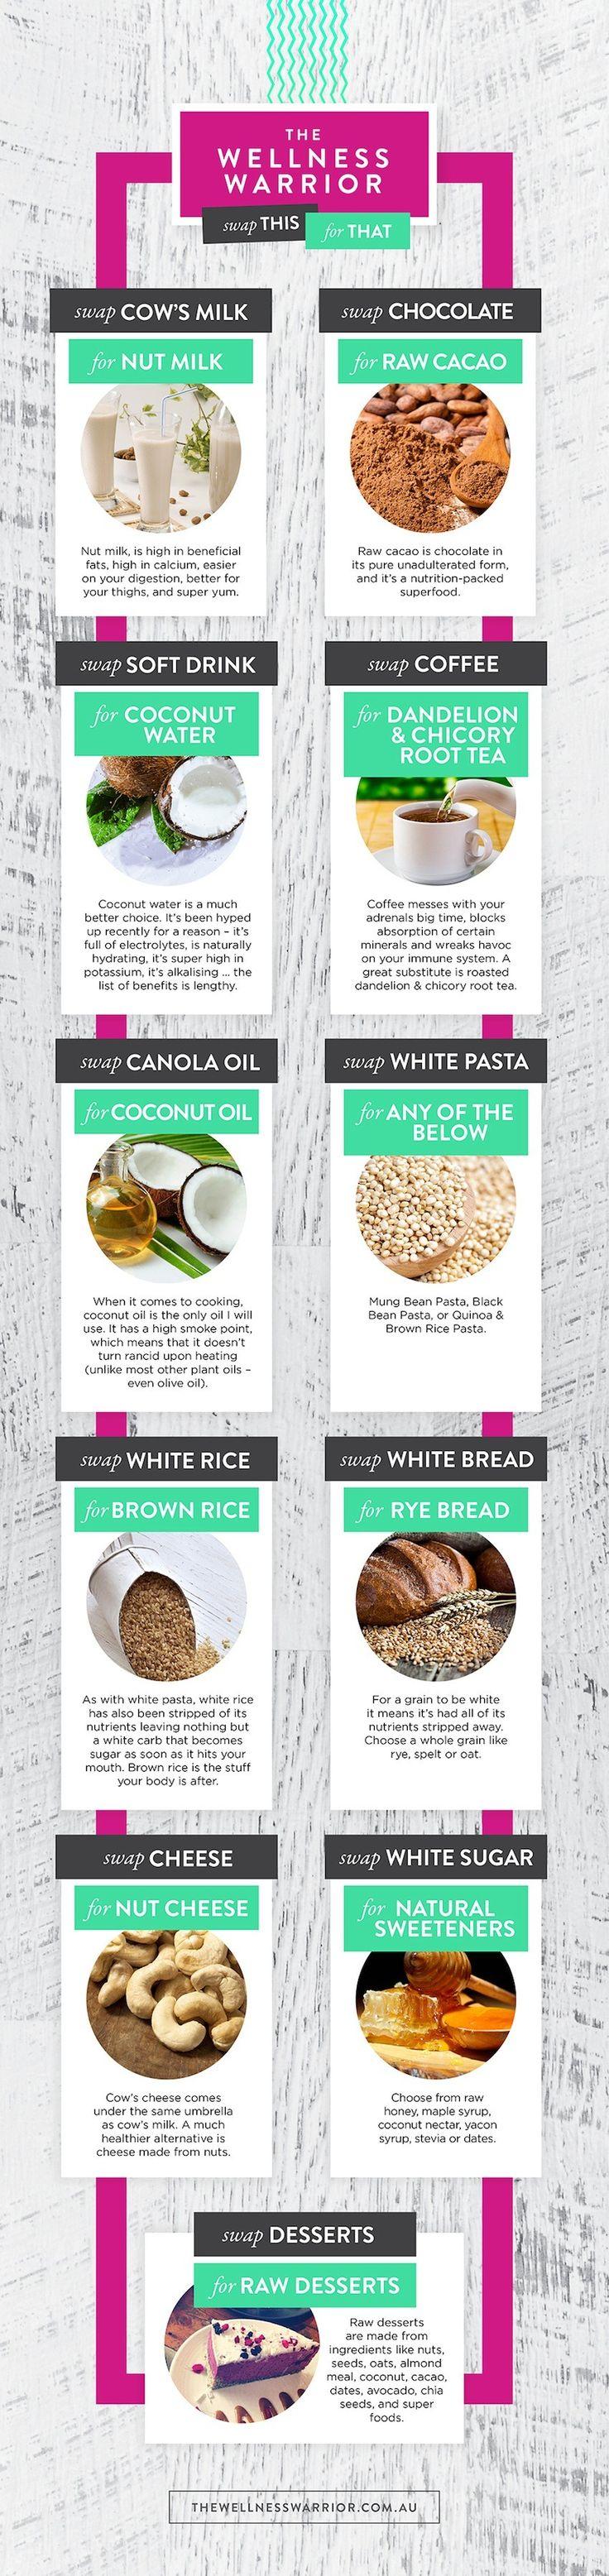 11 Healthy Food Swaps (Infographic)